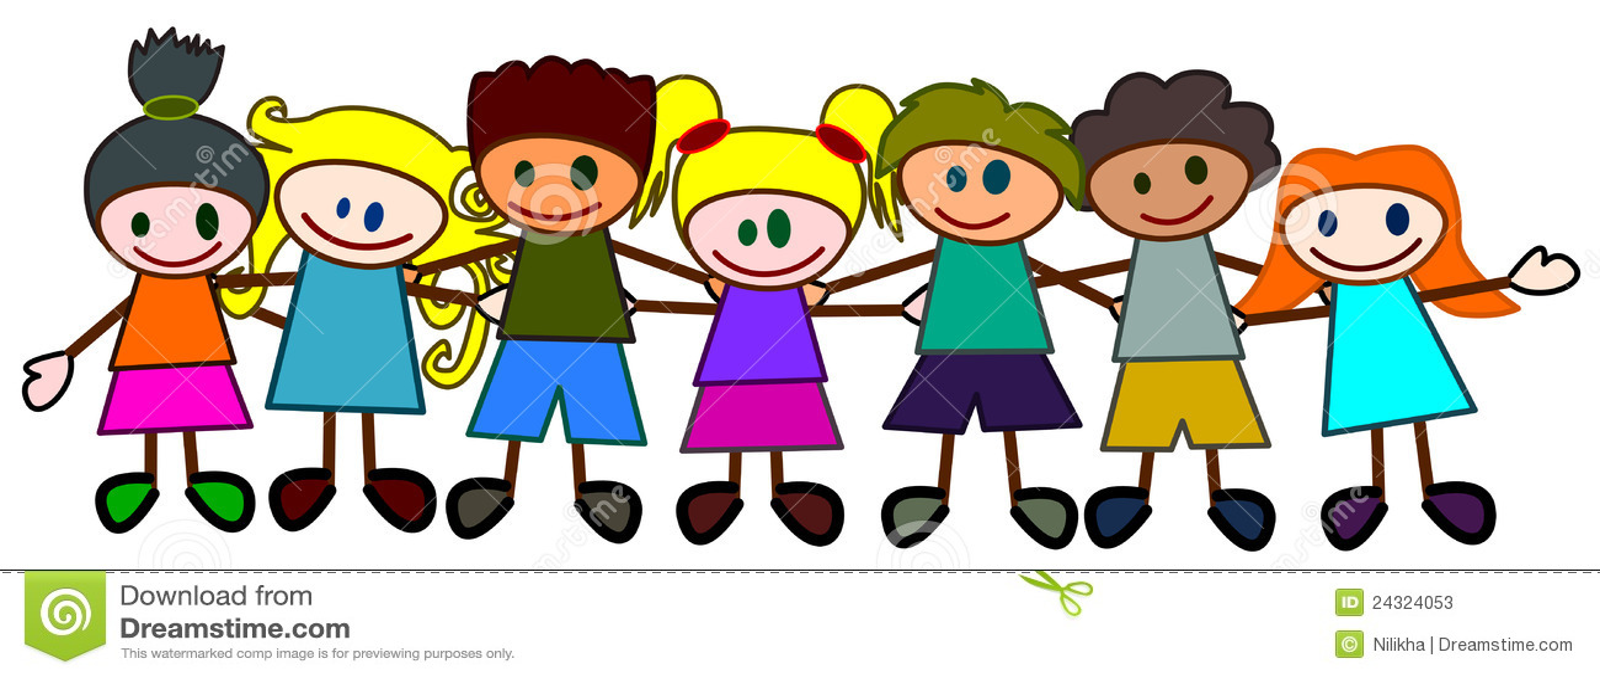 friends stock illustration illustration